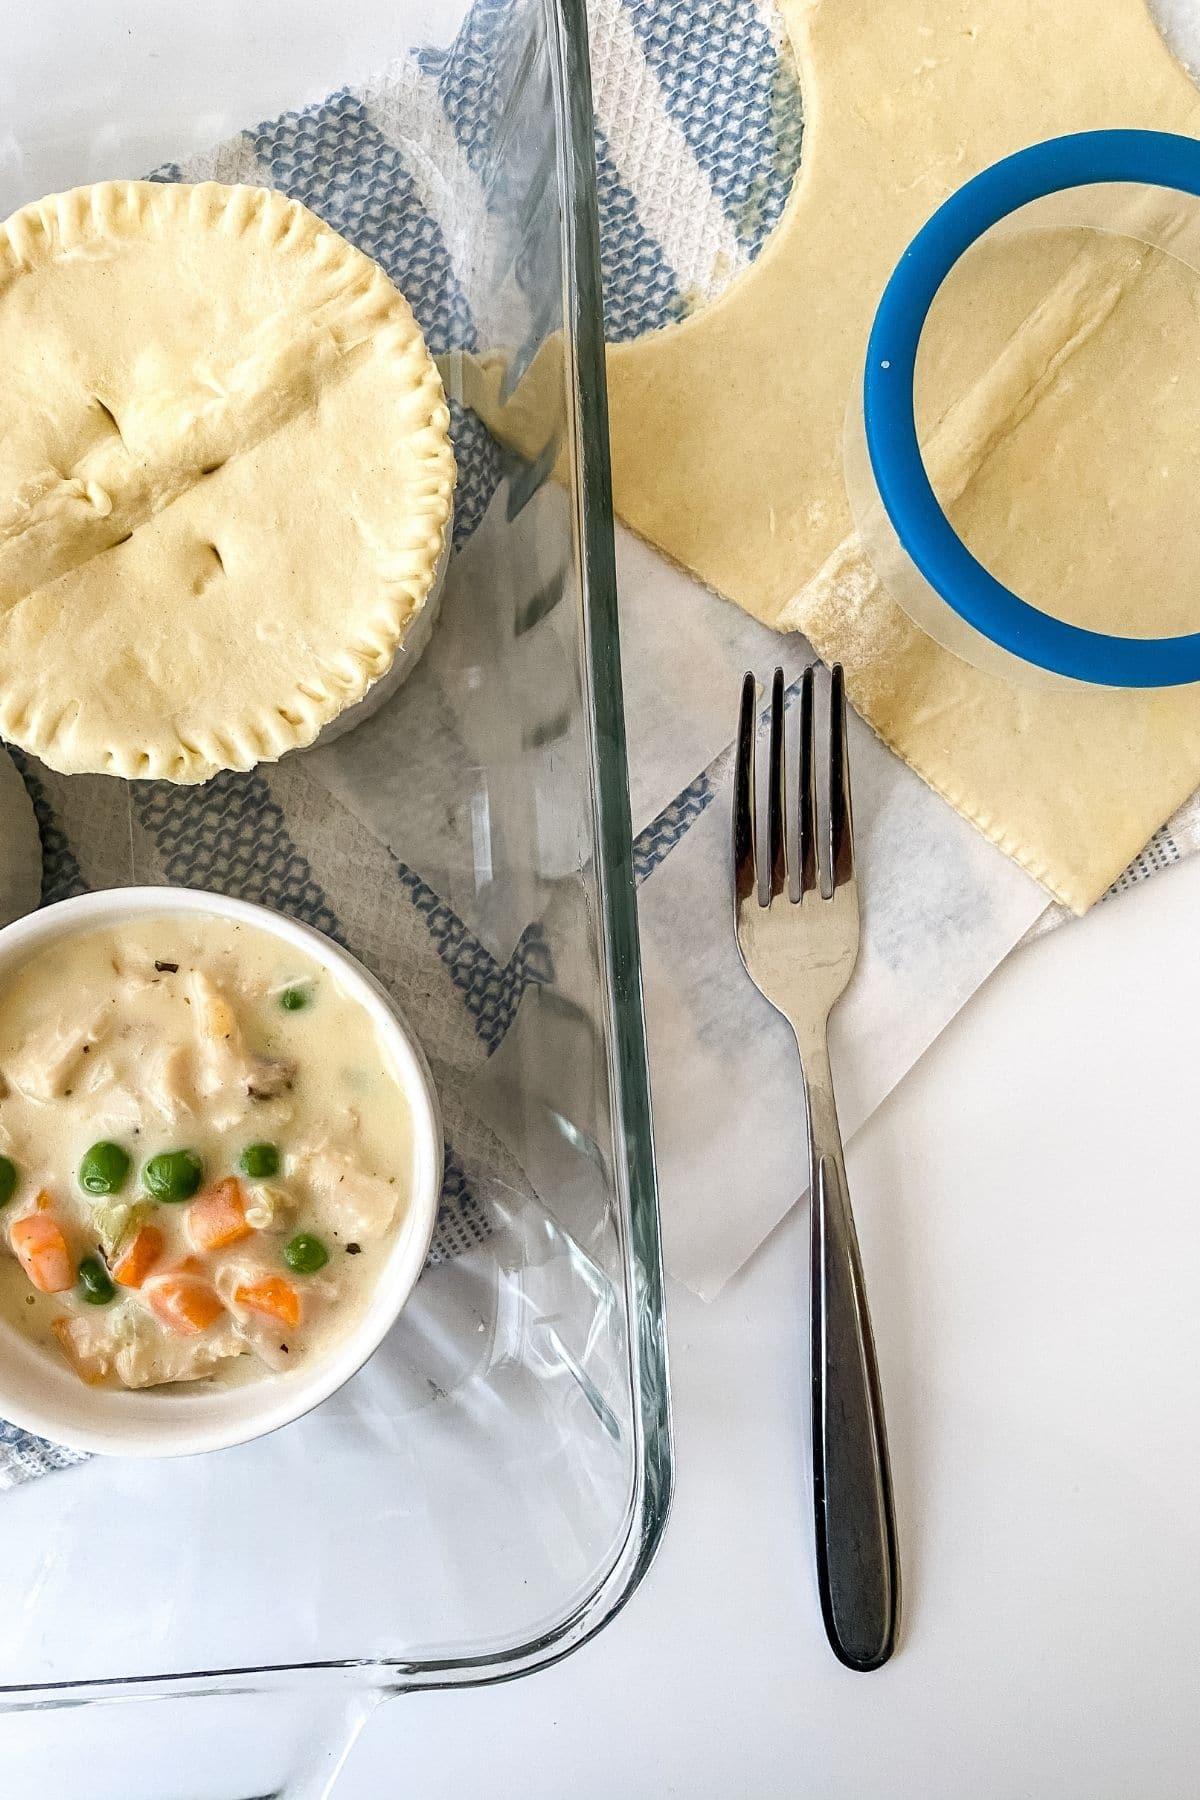 Adding crust to pot pies